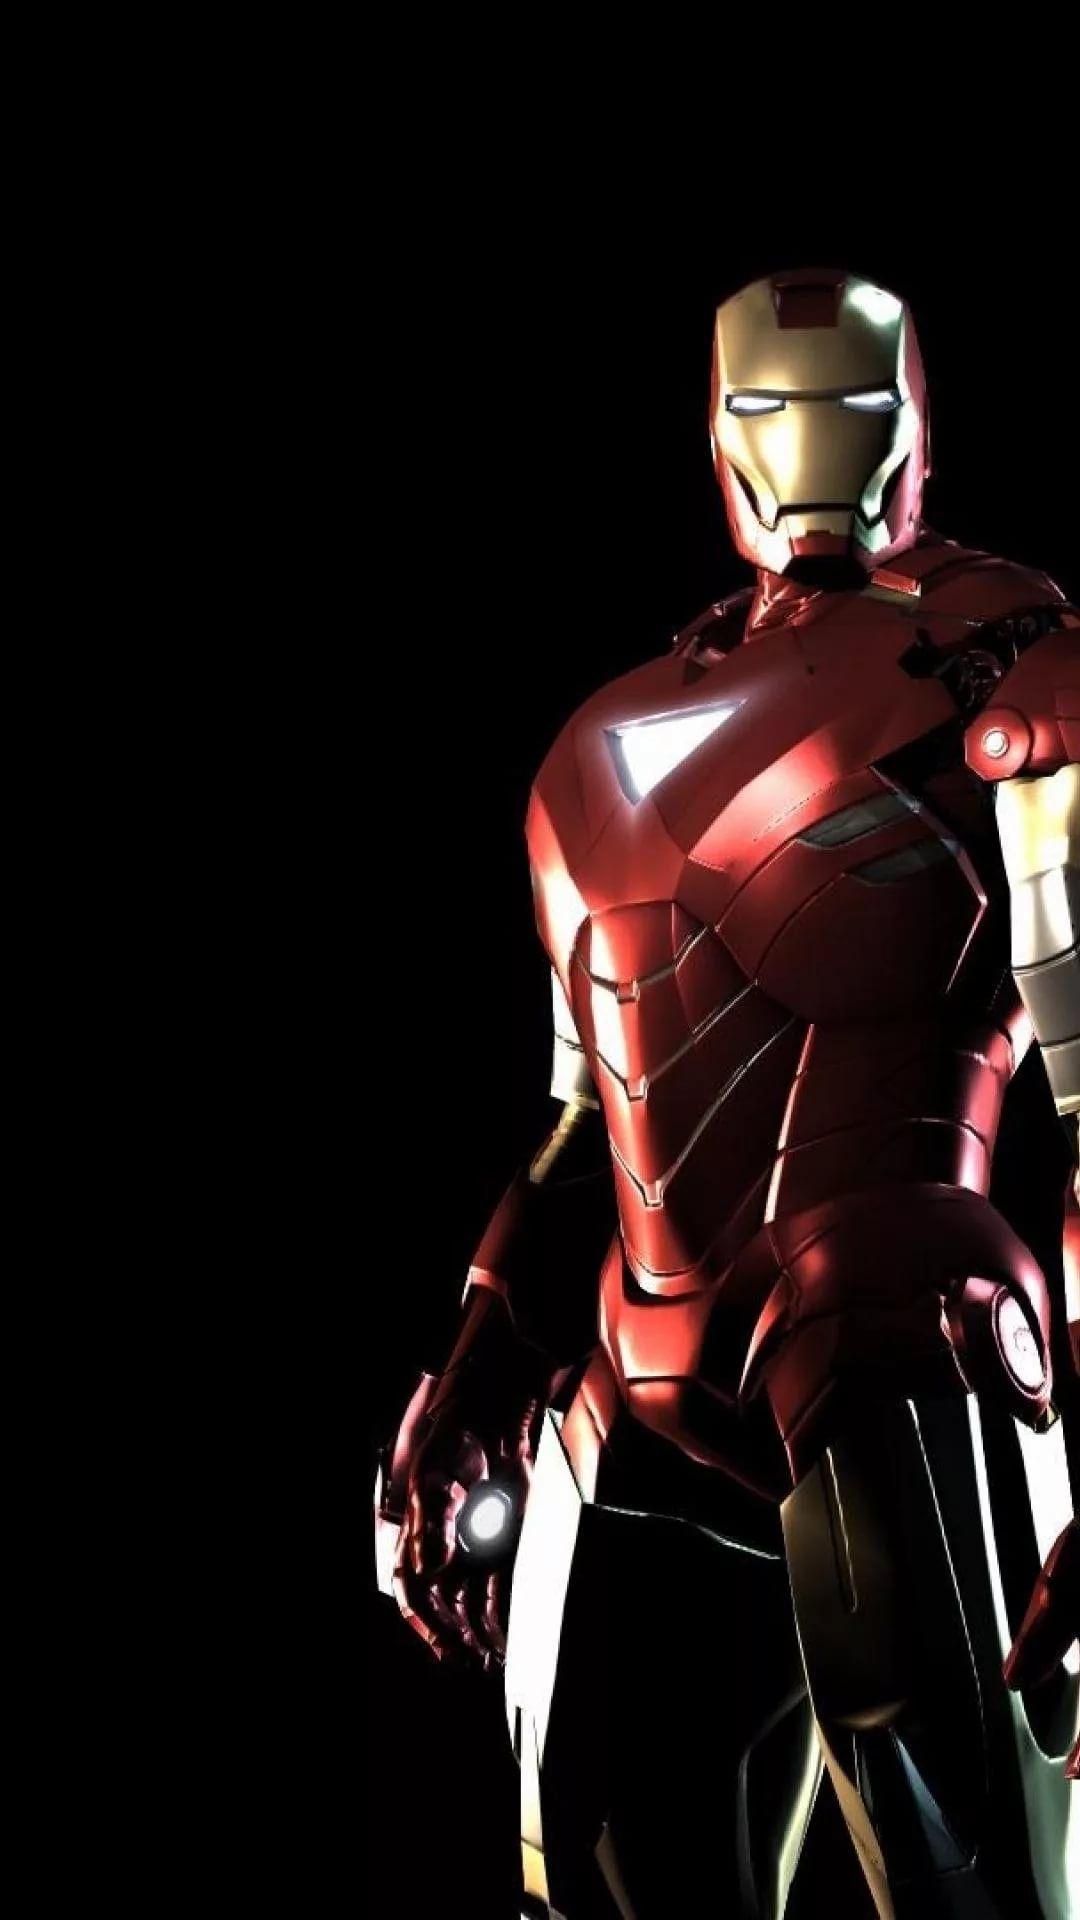 Iron Man D iOS wallpaper